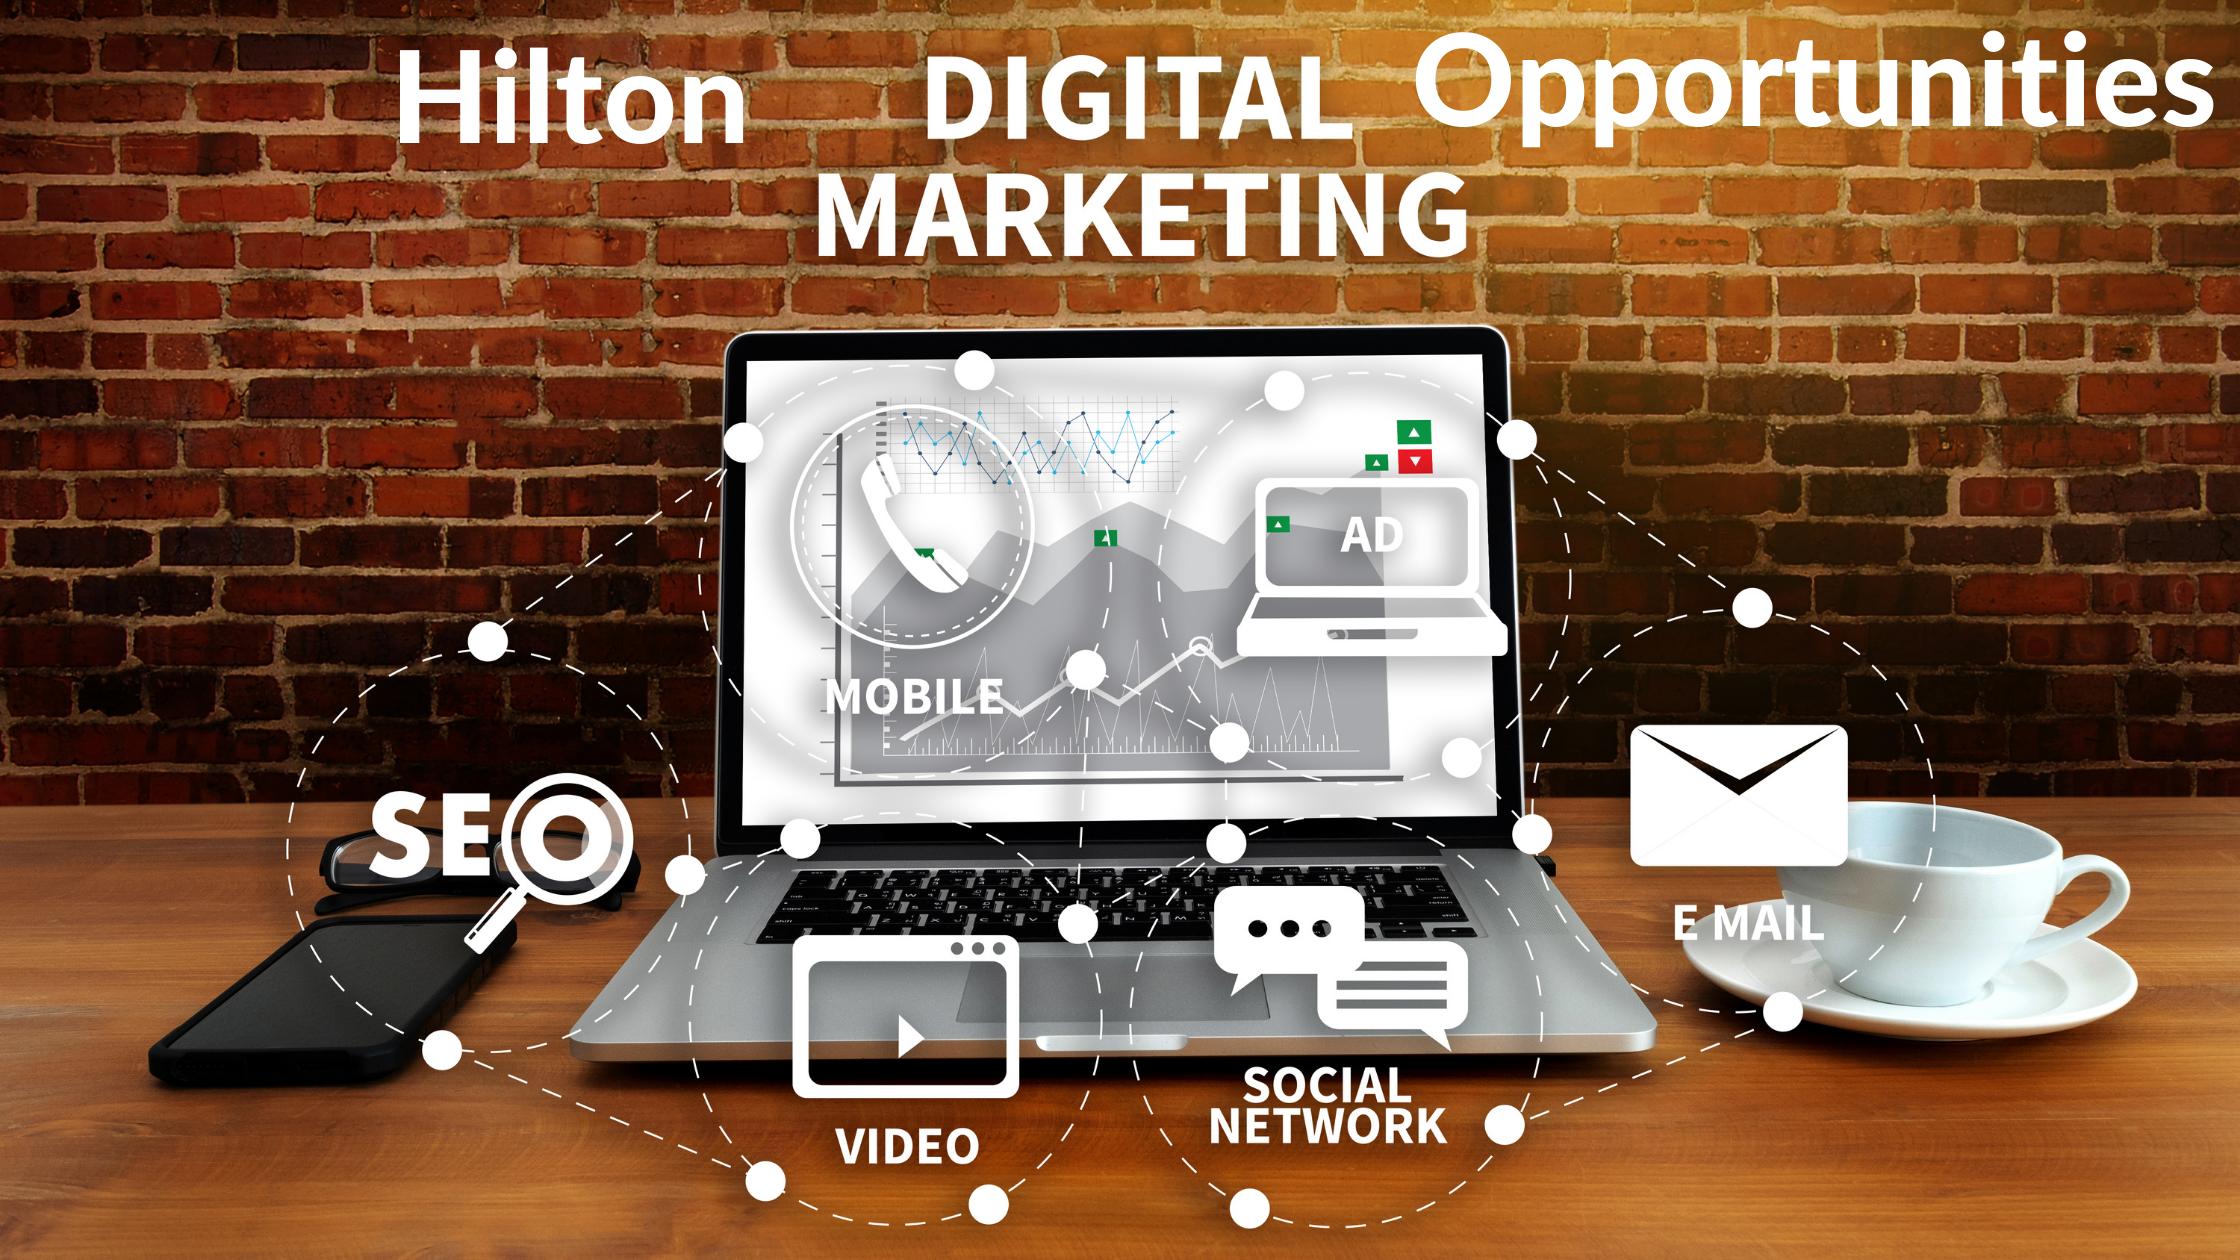 Hilton Digital Marketing Opportunities